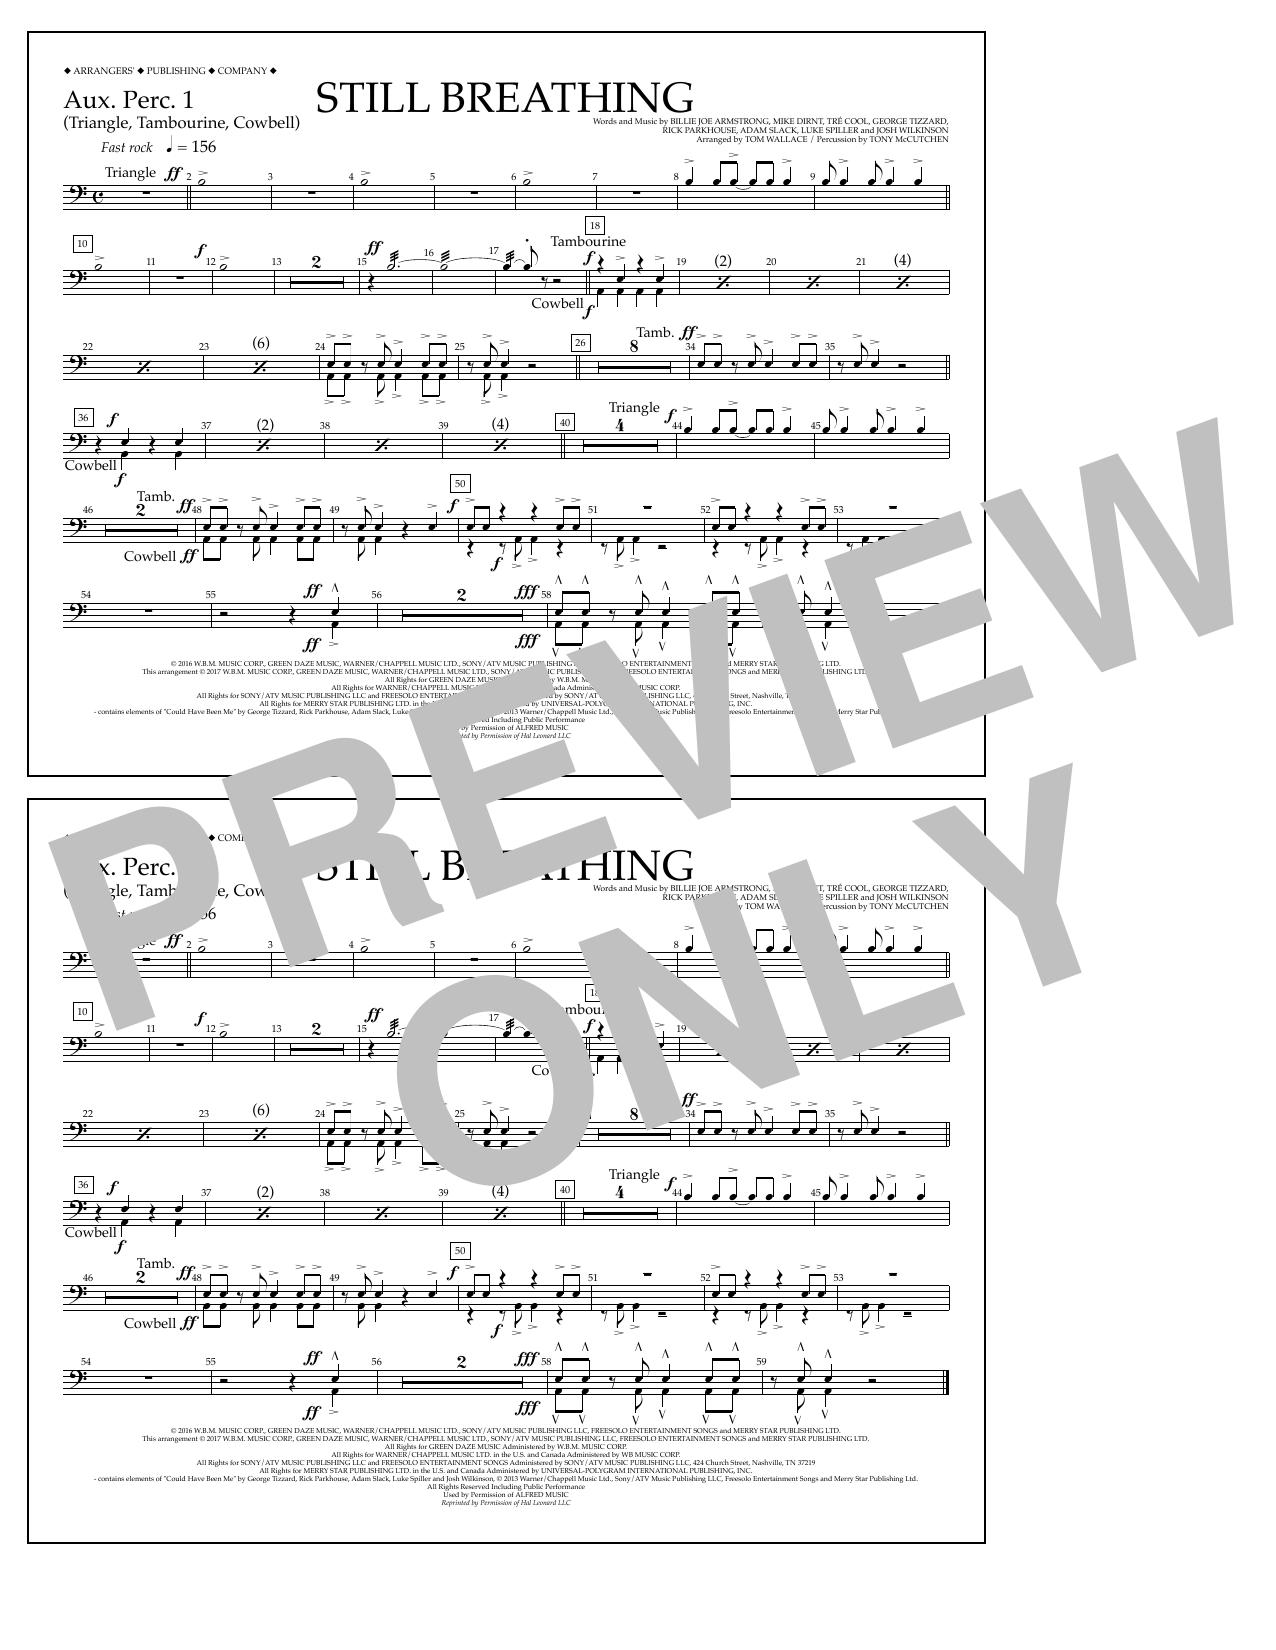 Still Breathing - Aux. Perc. 1 Sheet Music